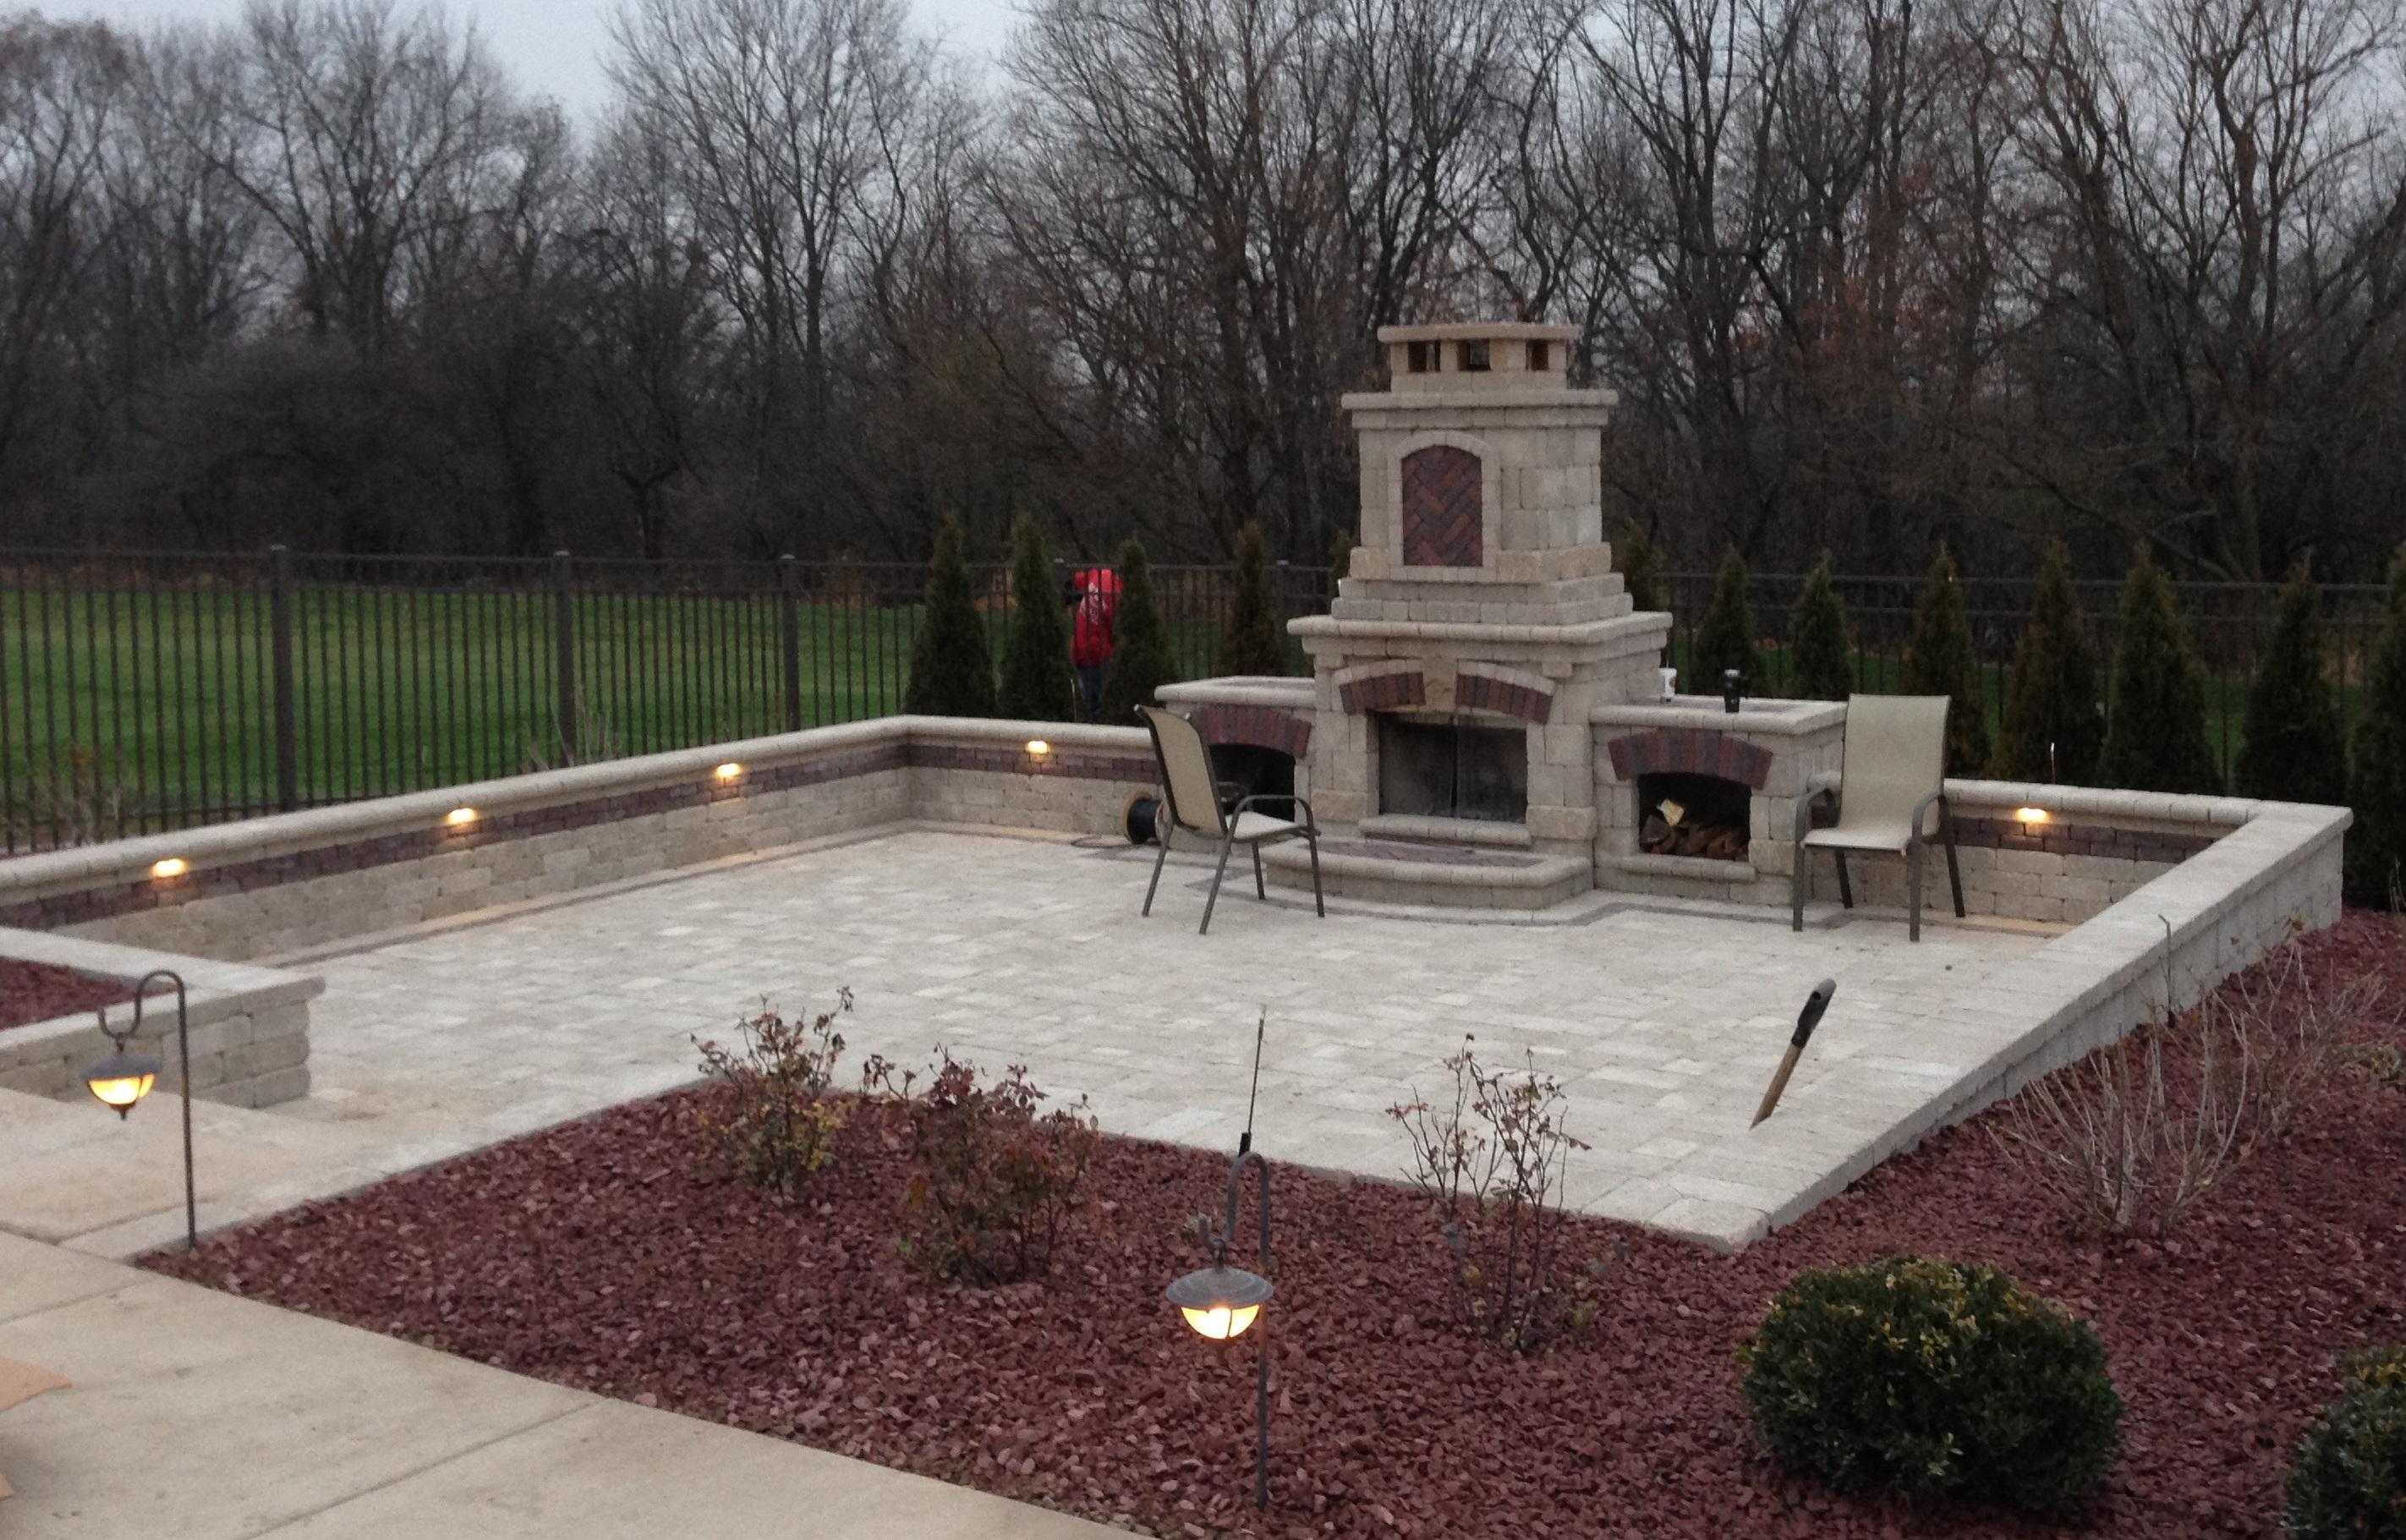 Fireplace patio with lighting